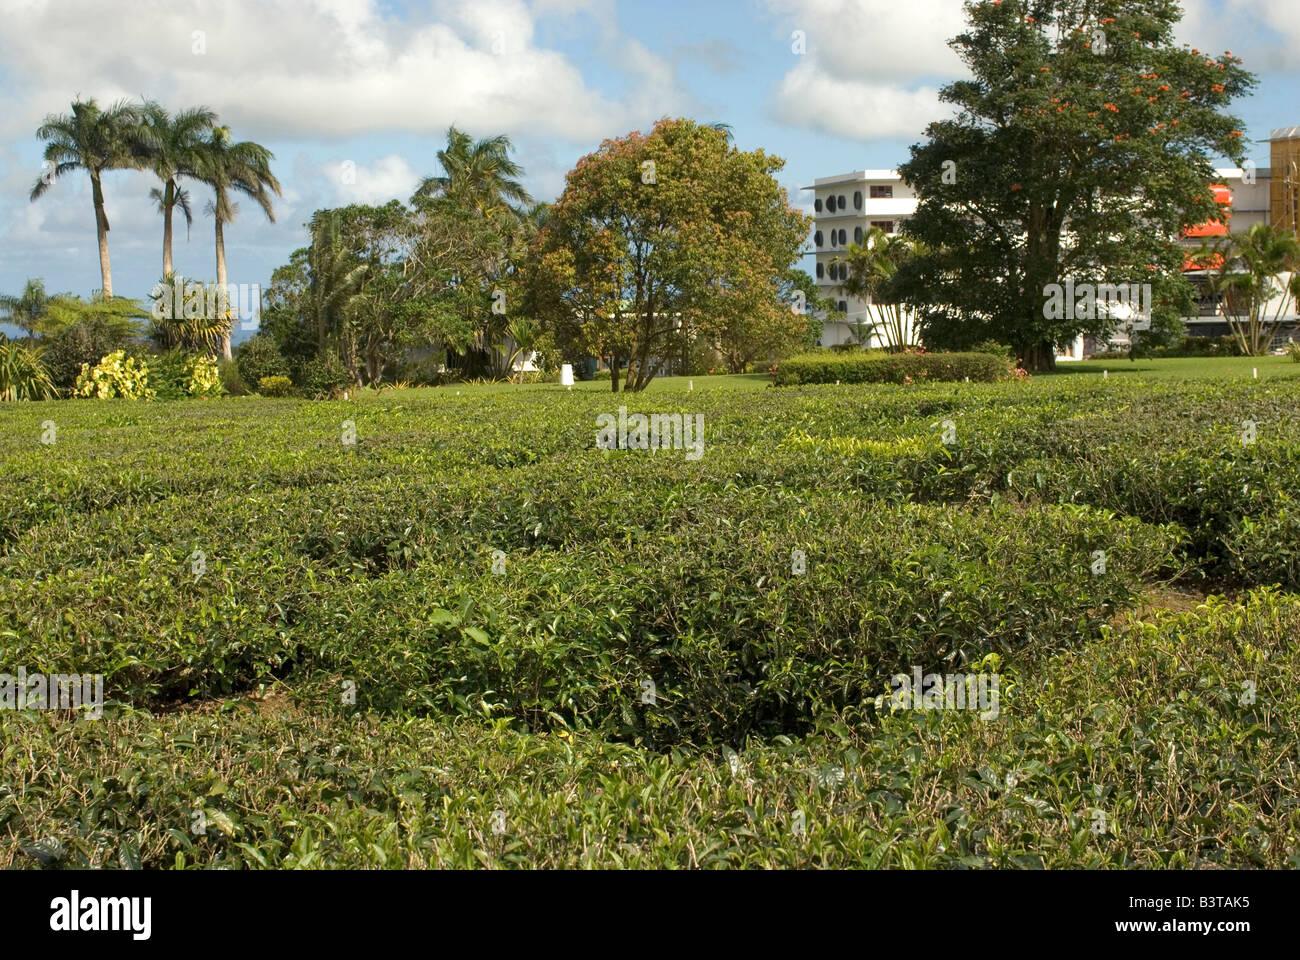 Mauritius Bois Cheri Tea Estate Produces 7 Different Types Of Black